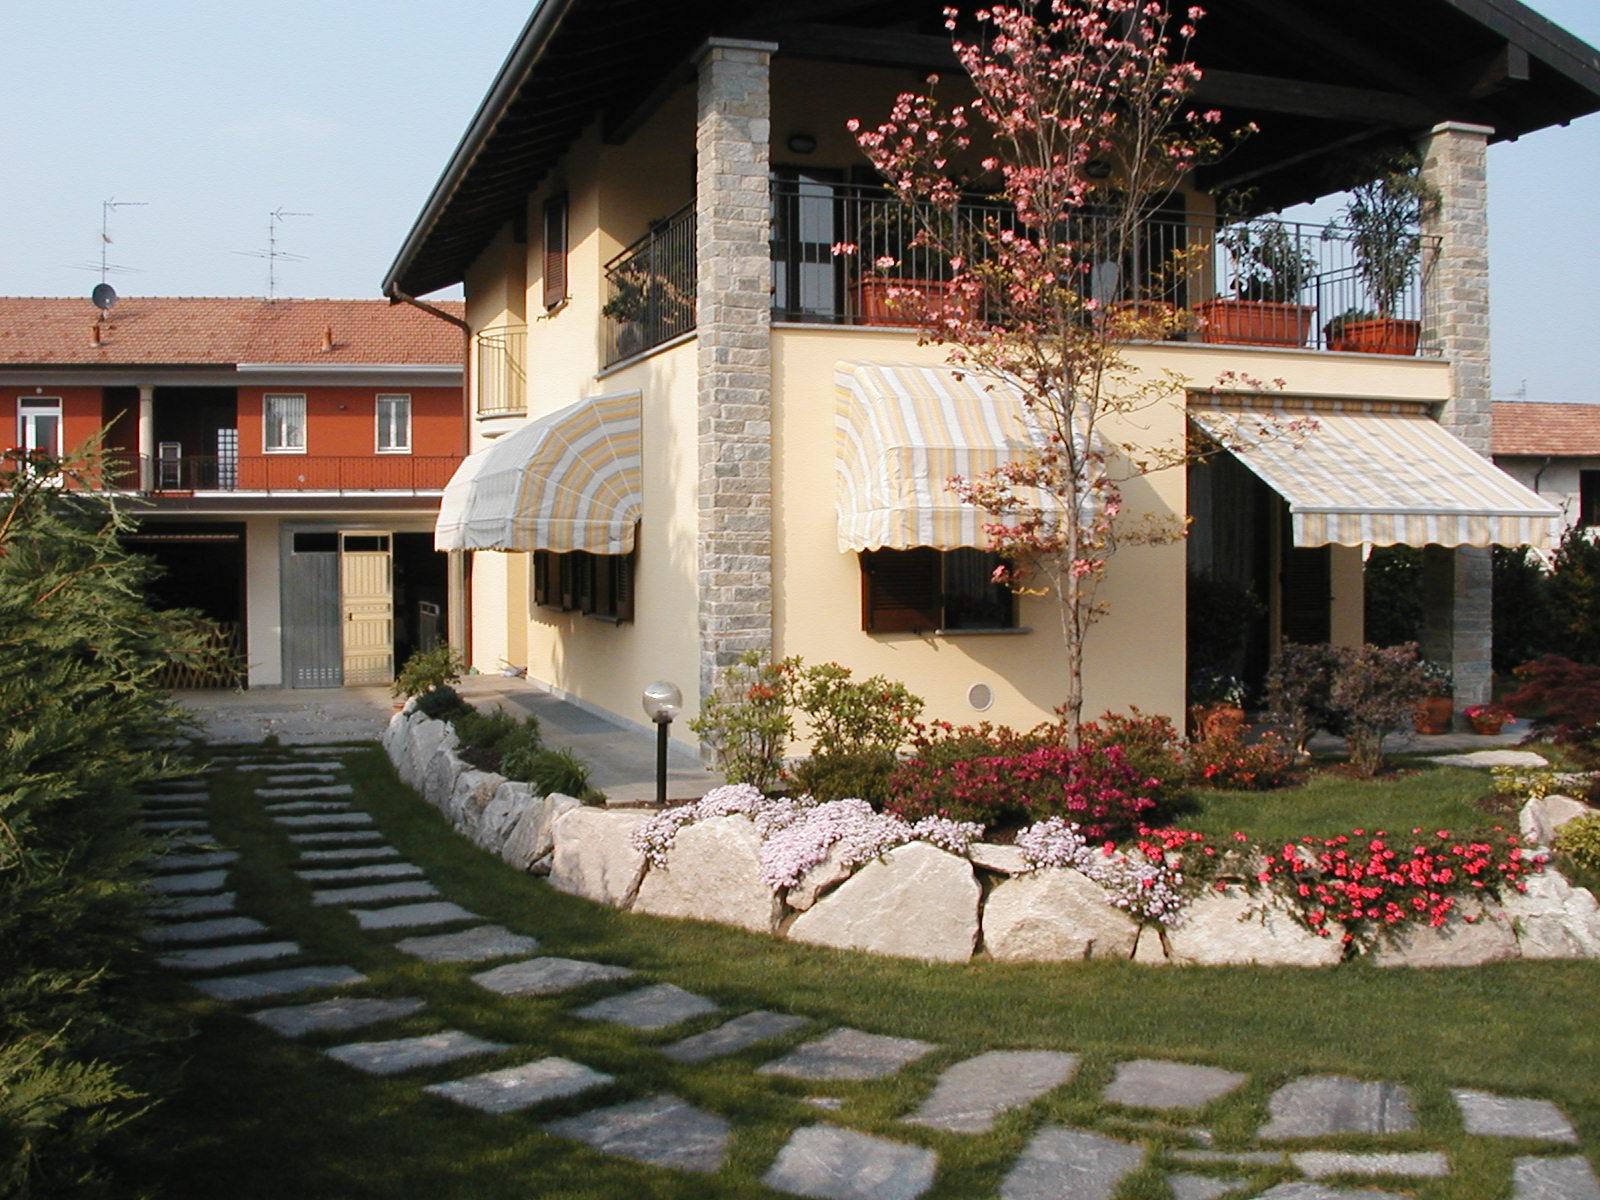 Vialetti_da_giardino (70)